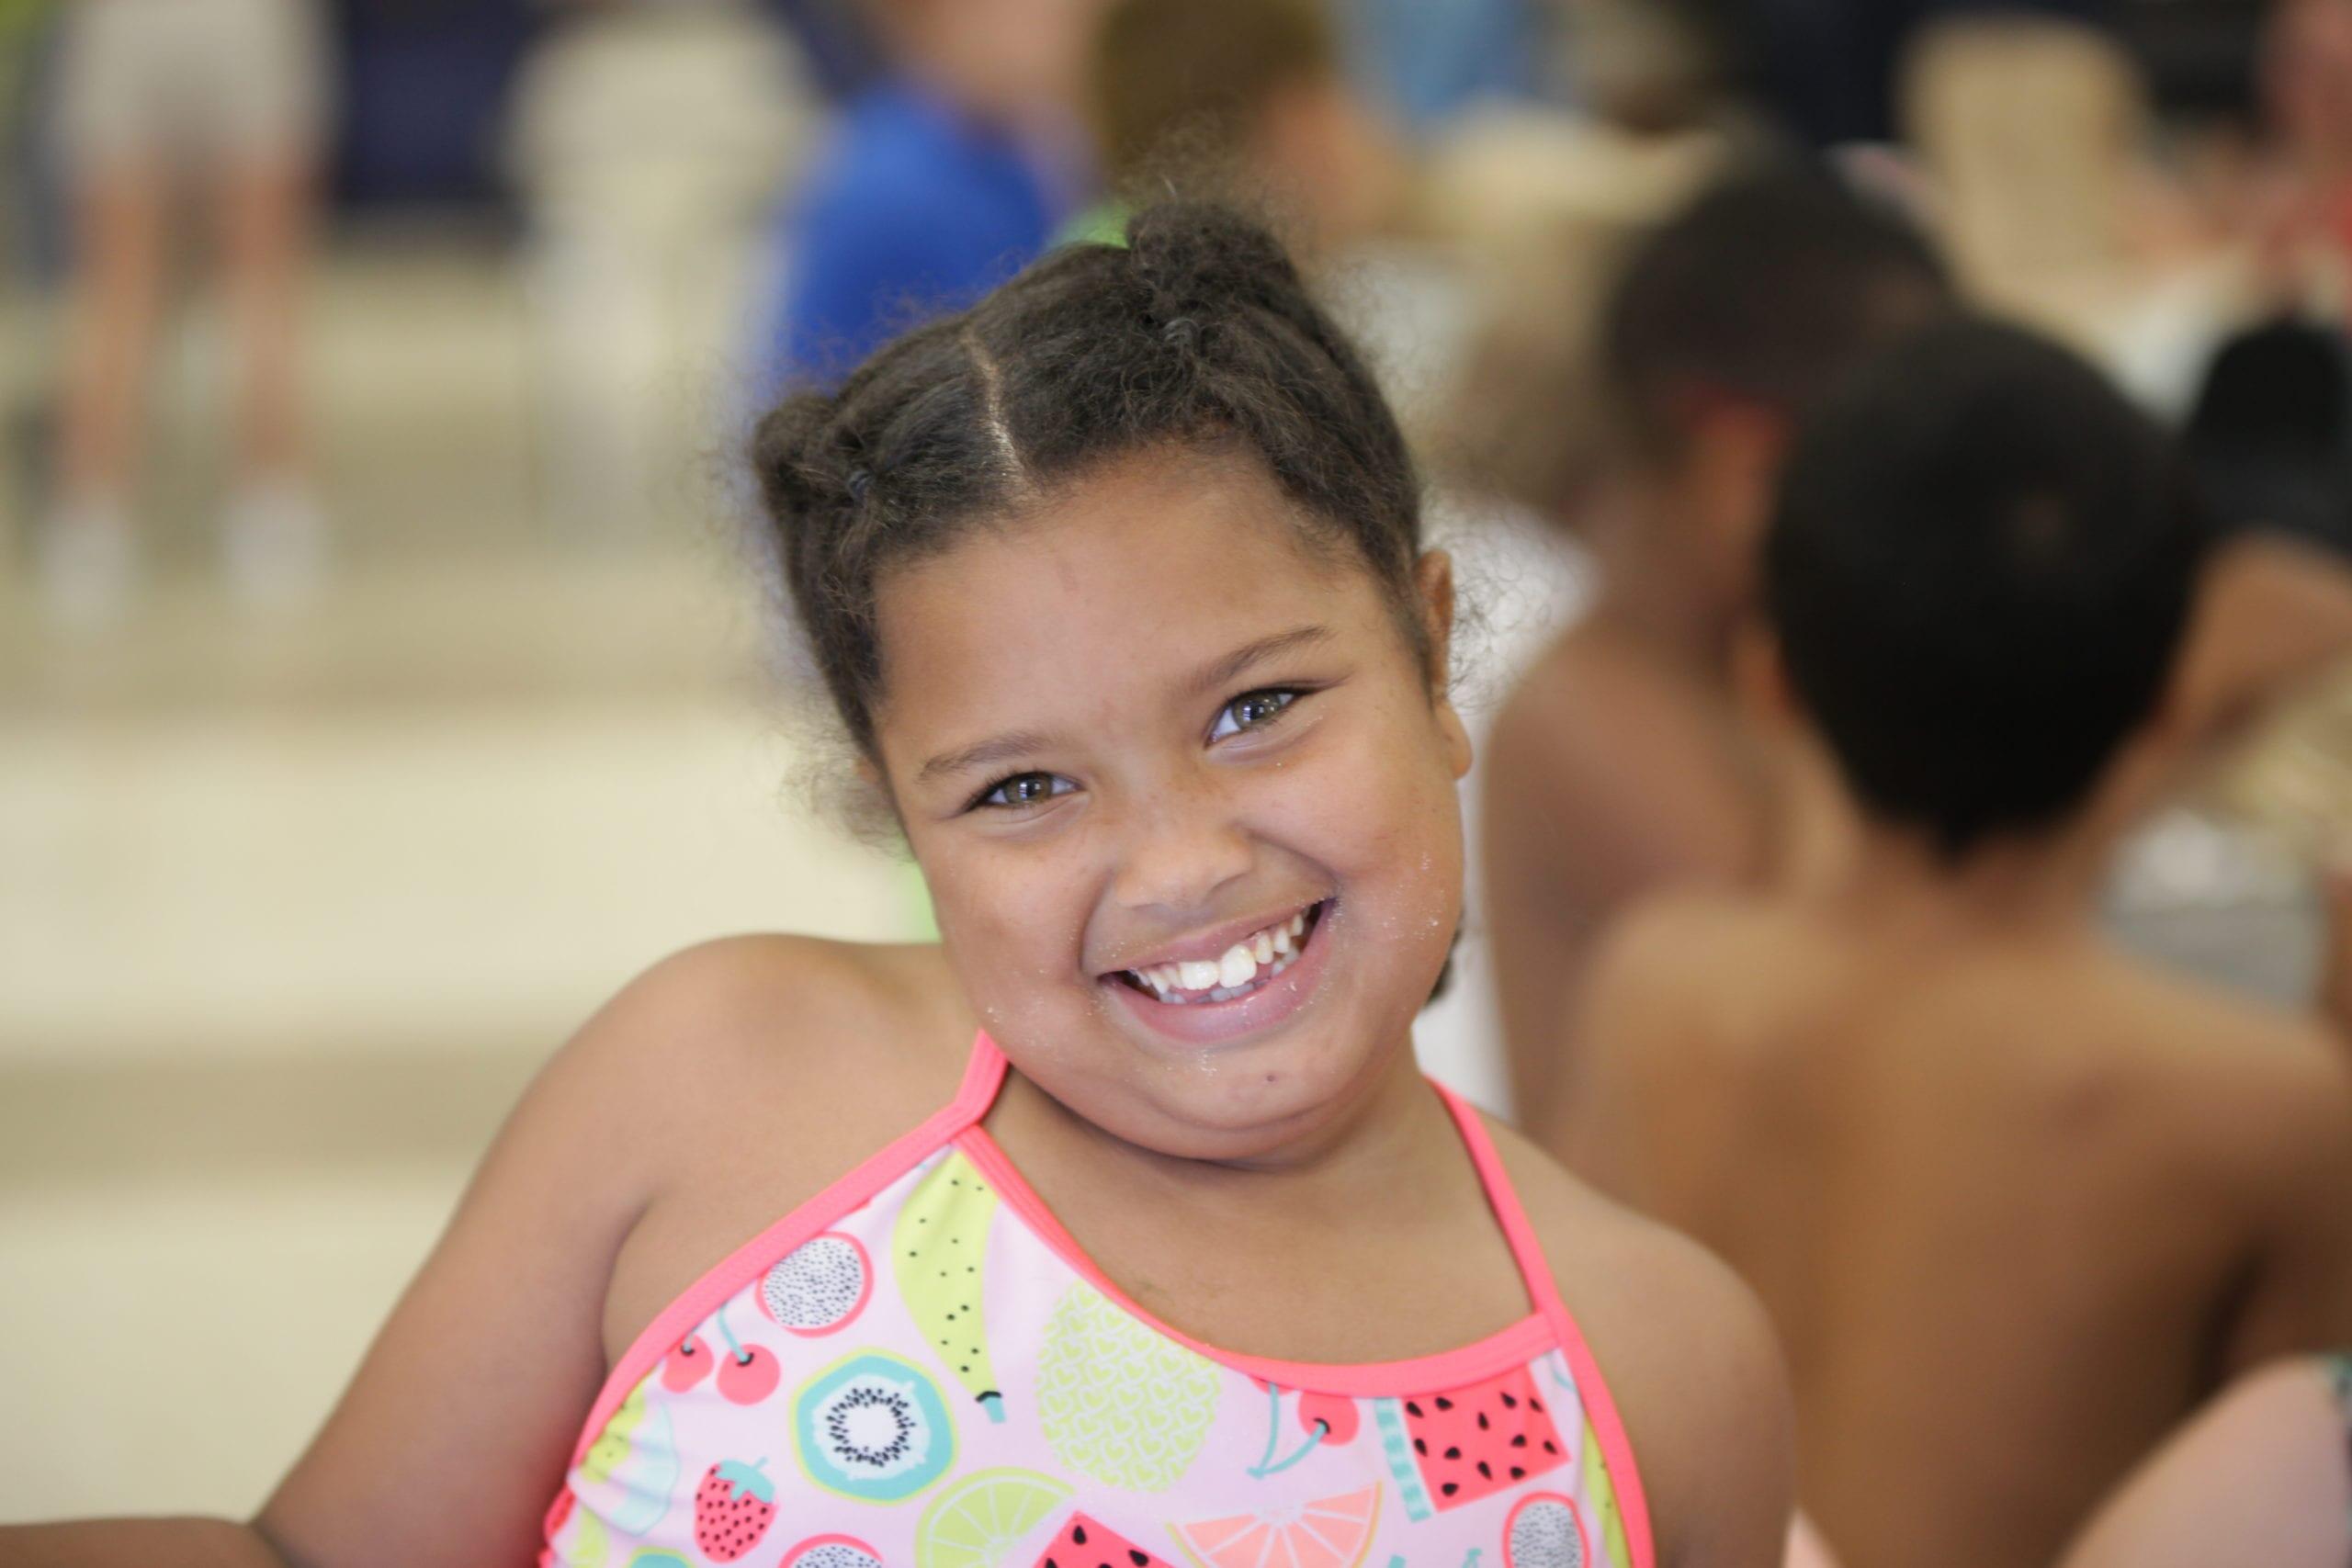 Healthy Kids Day - Hogan Family YMCA | Rocket City Mom